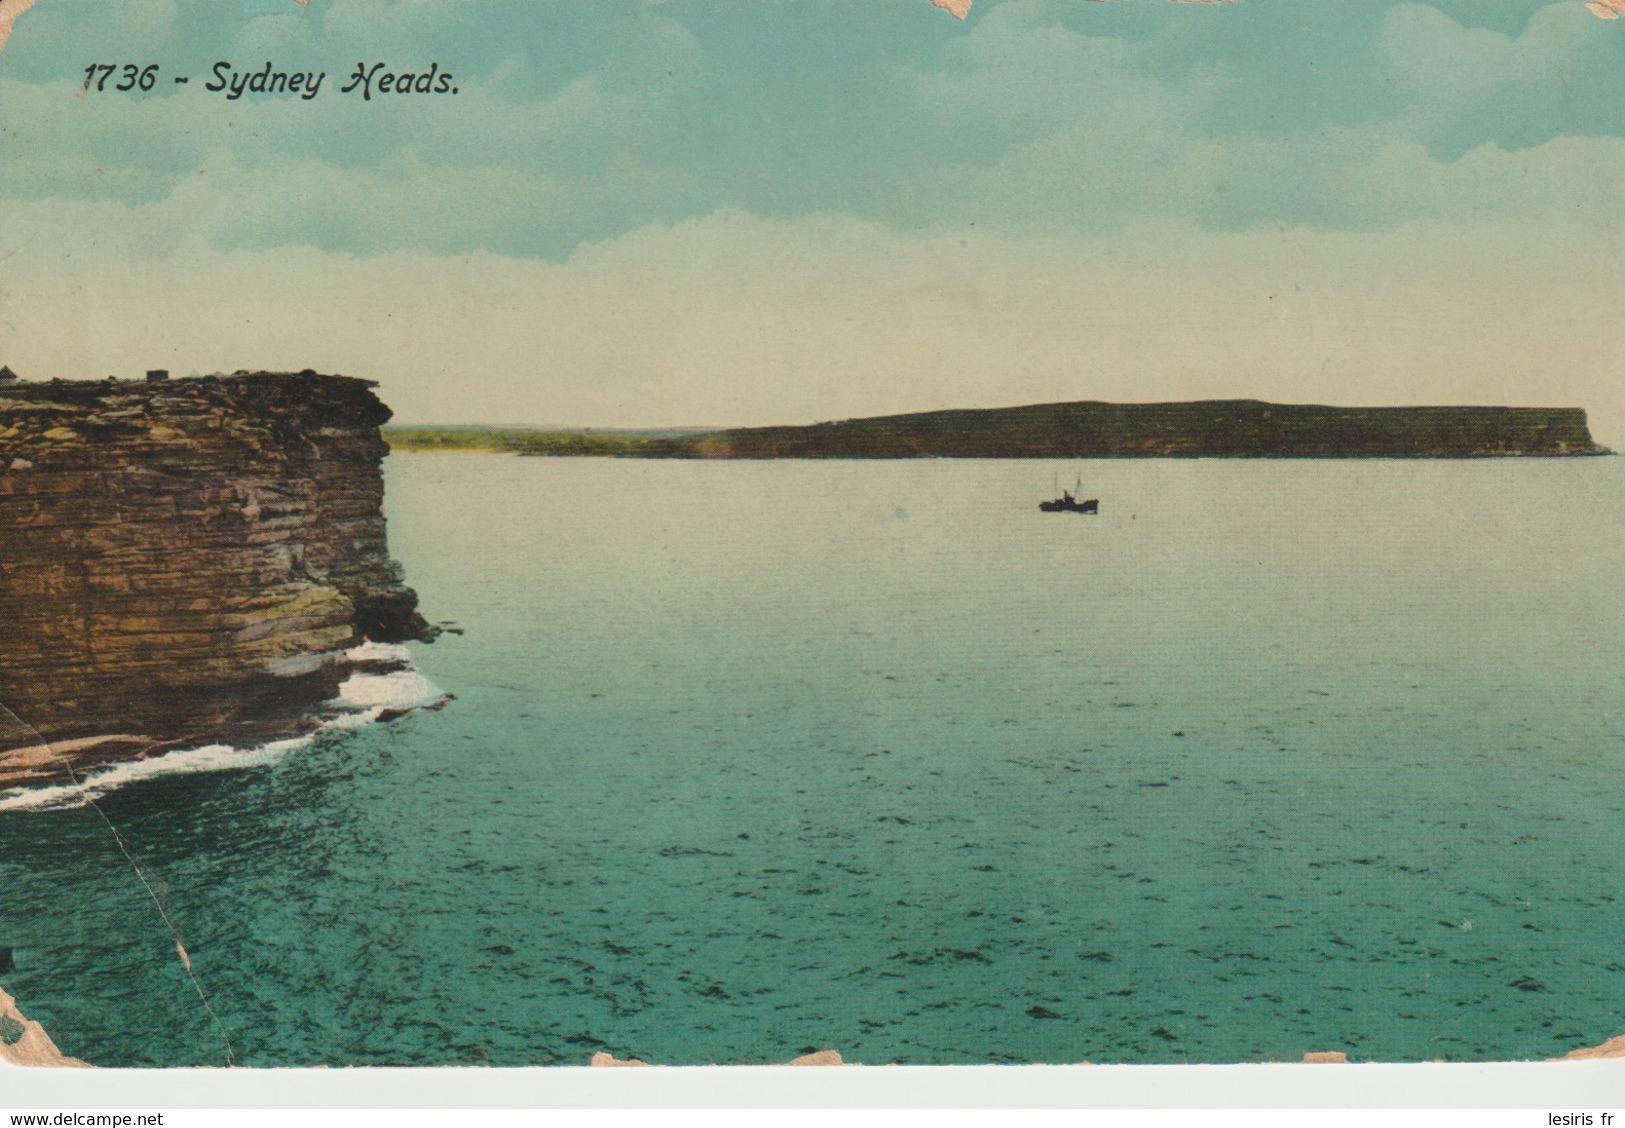 C.P.A. - SYDNEY - HEADS - 1736 - NATURE SERIES - S. W. - Sydney